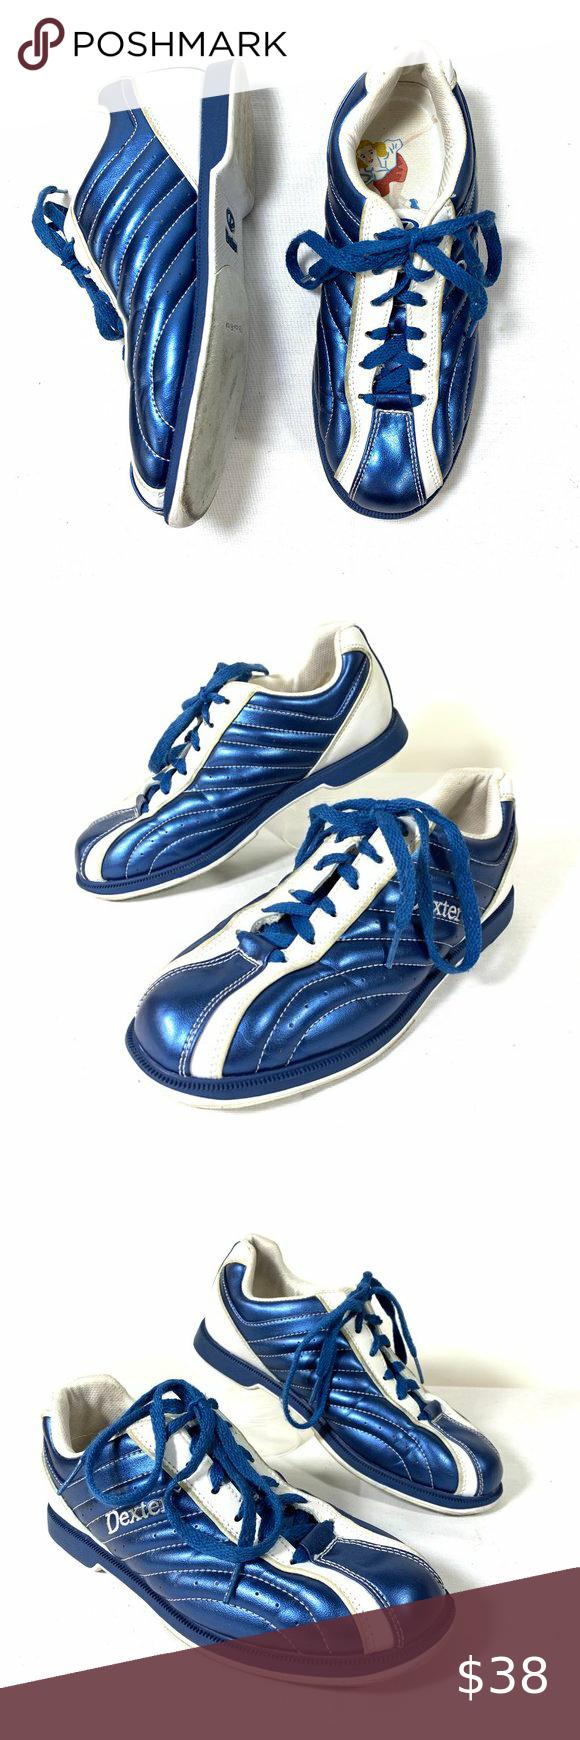 Dexter Bowling Shoes Blue Groove Slide Rite 6 5 Bowling Shoes Blue Shoes Dexter Shoes [ 1740 x 580 Pixel ]